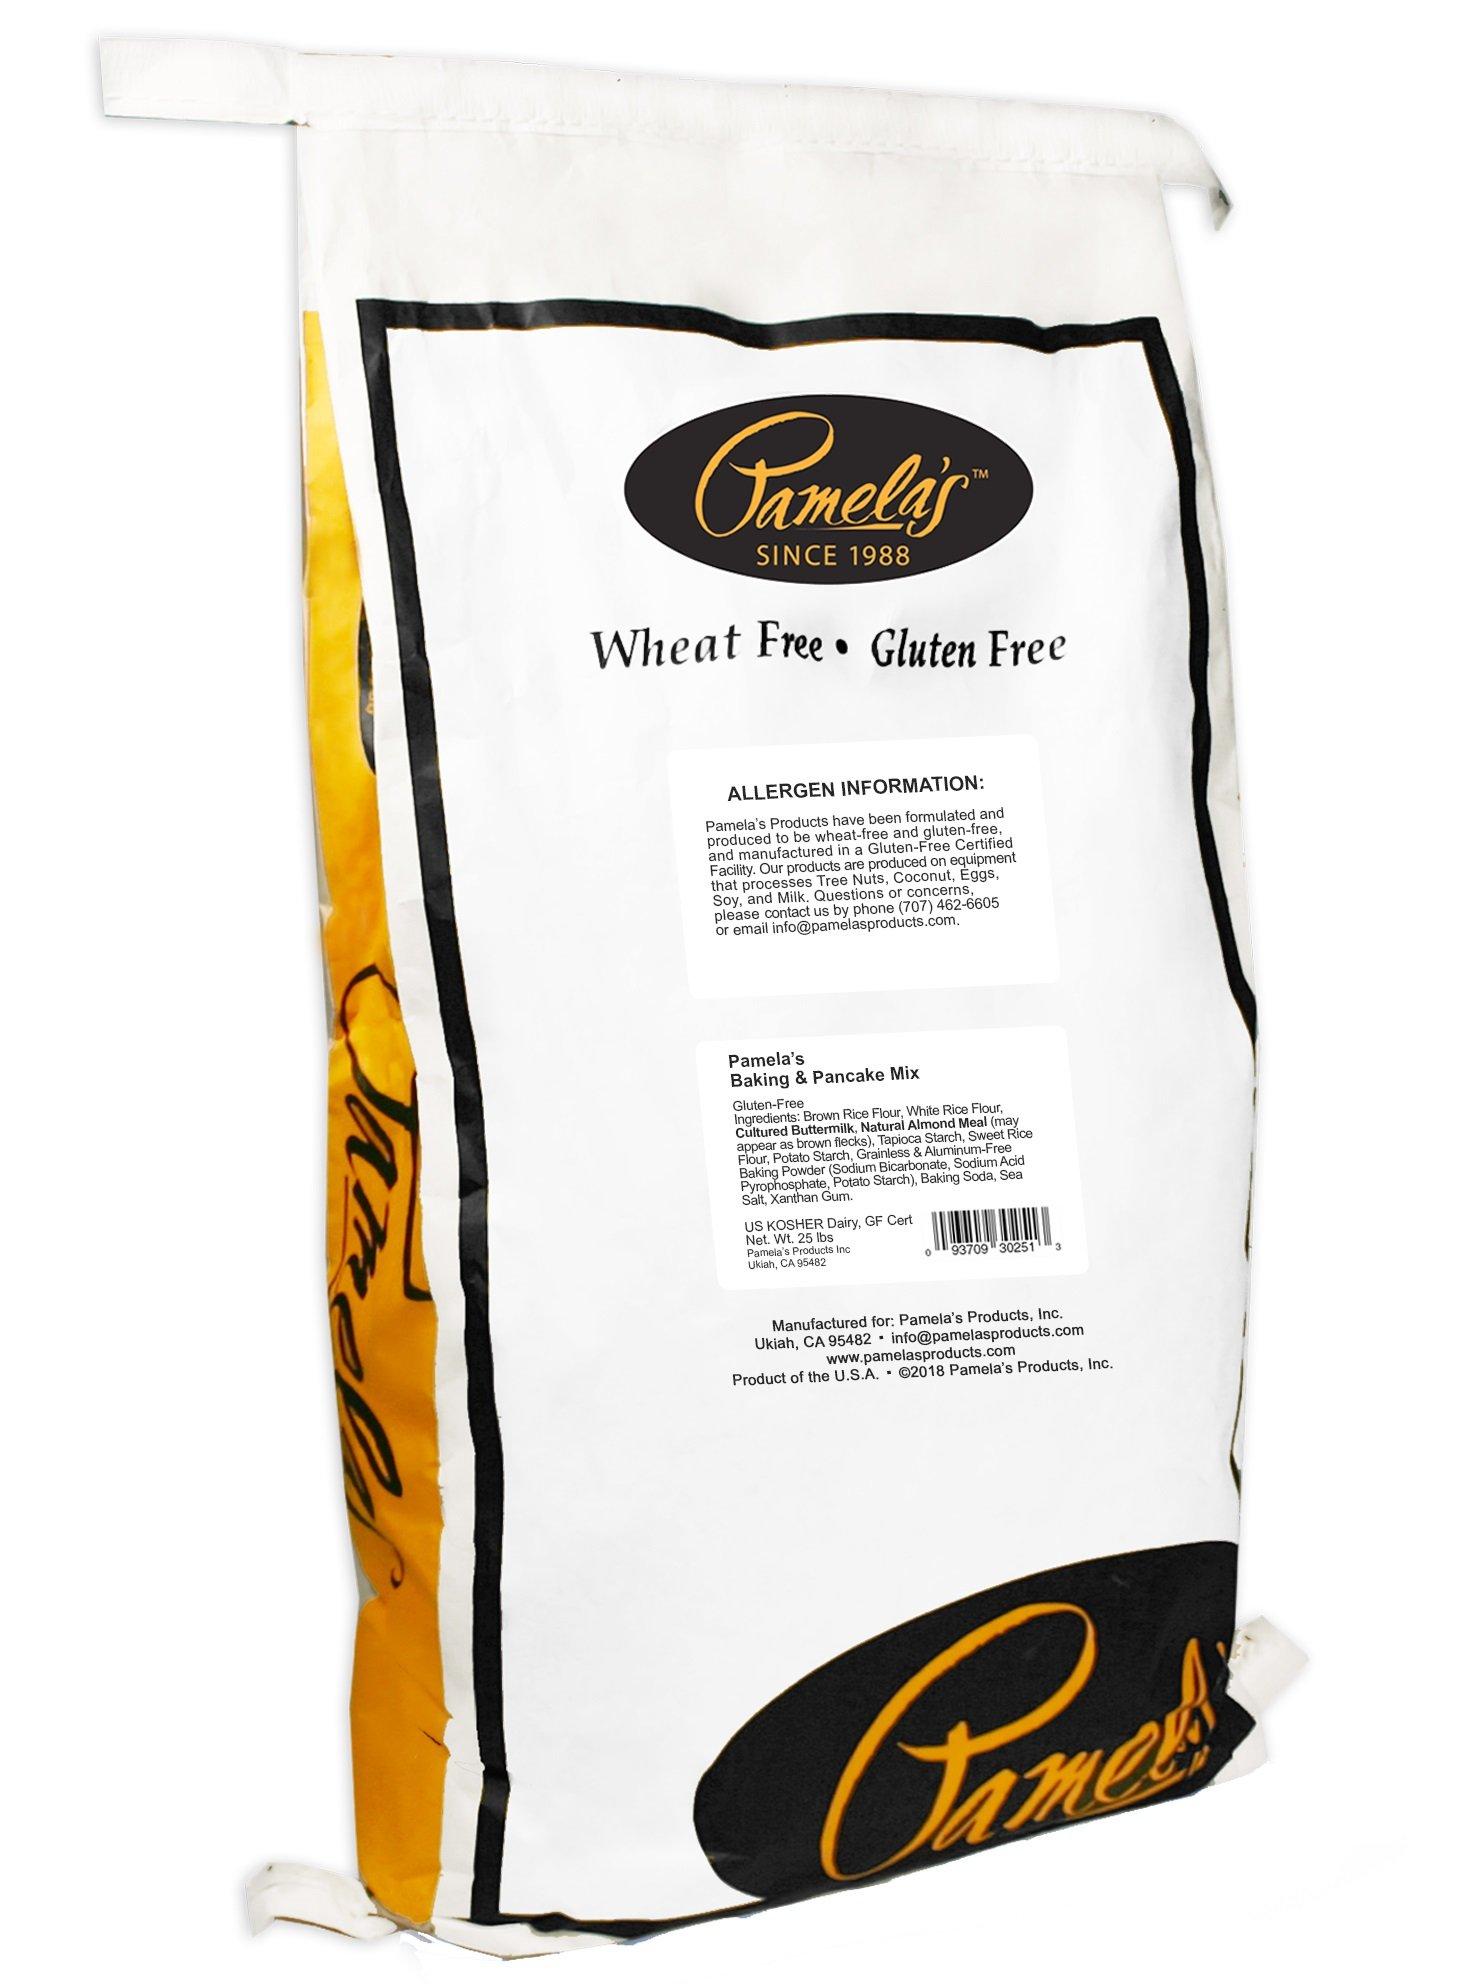 Pamela's Products Gluten Free Baking & Pancake Mix, 25-Pound Bag by Pamela's Products